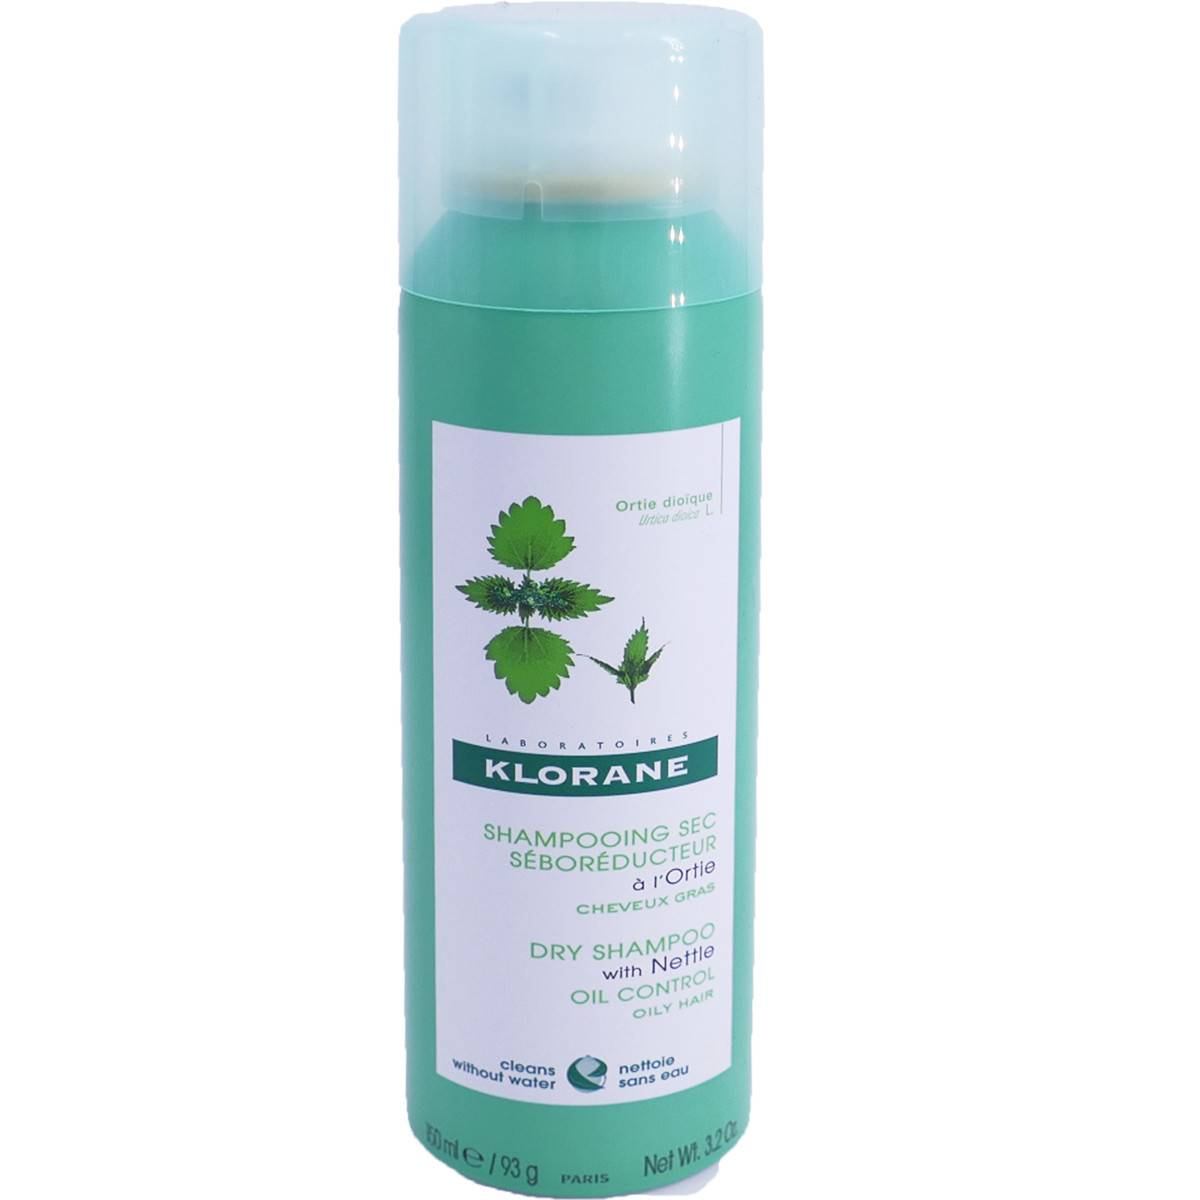 Klorane shampooing sec a l'ortie cheveux gras 150 ml